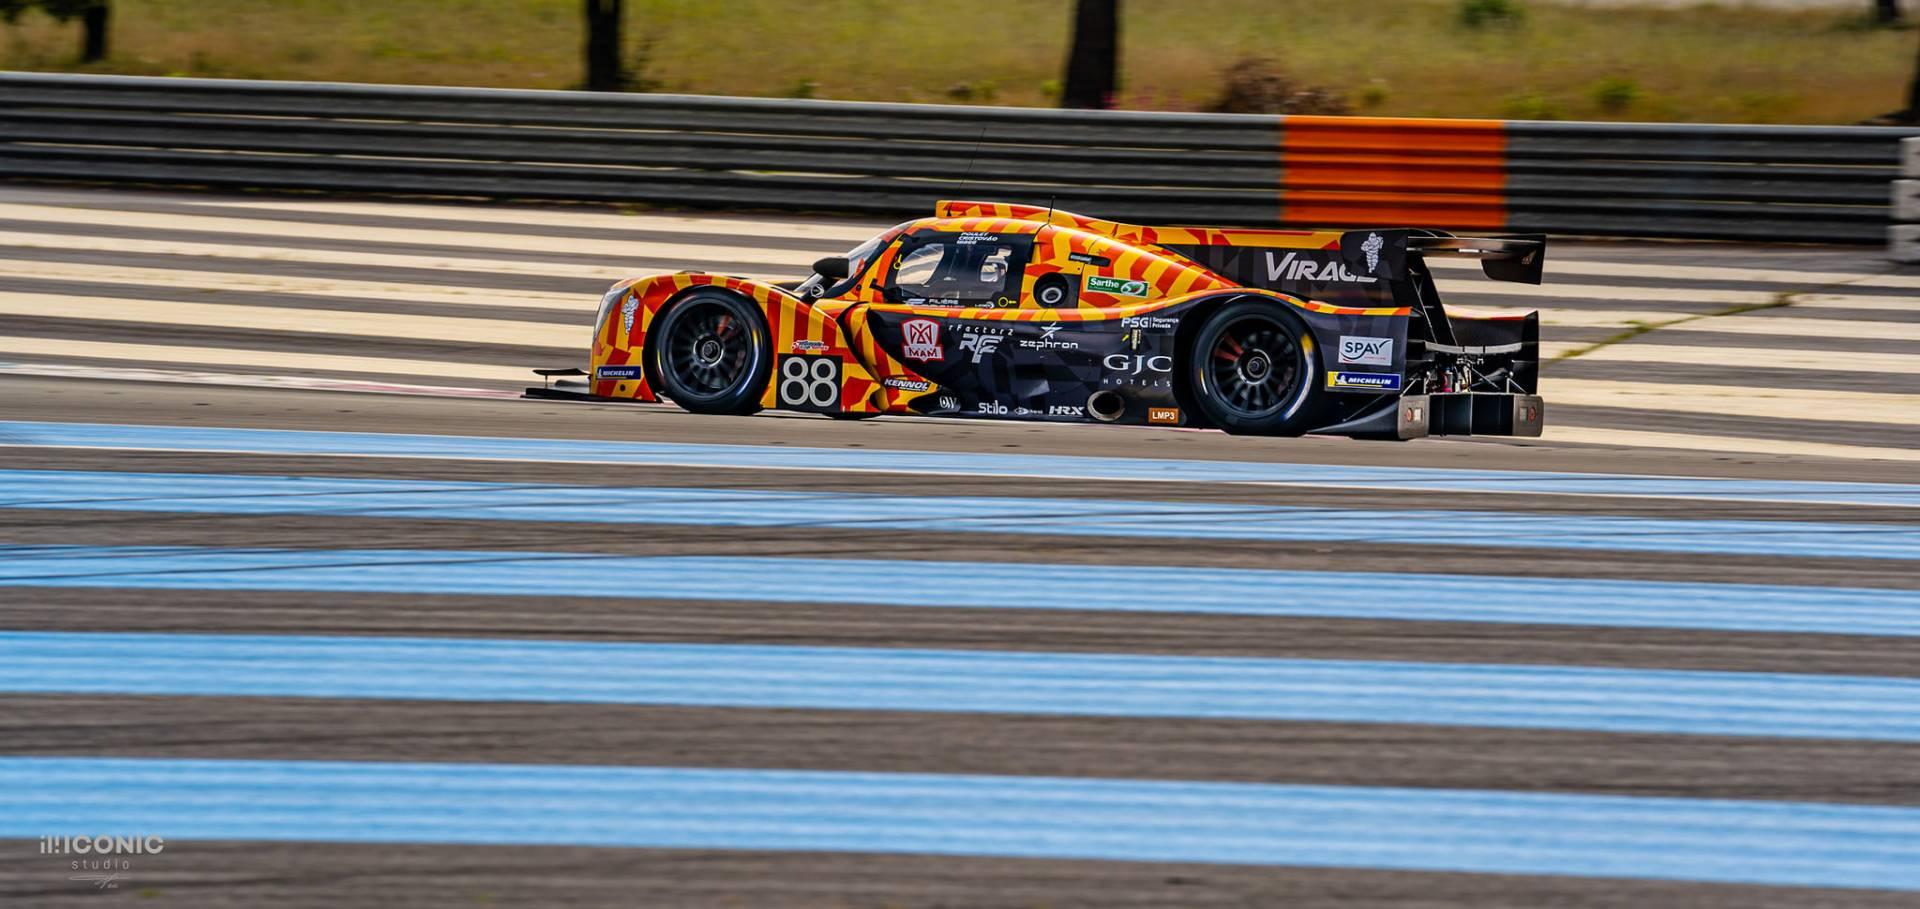 Ligier JS P320 #88 Team Virage